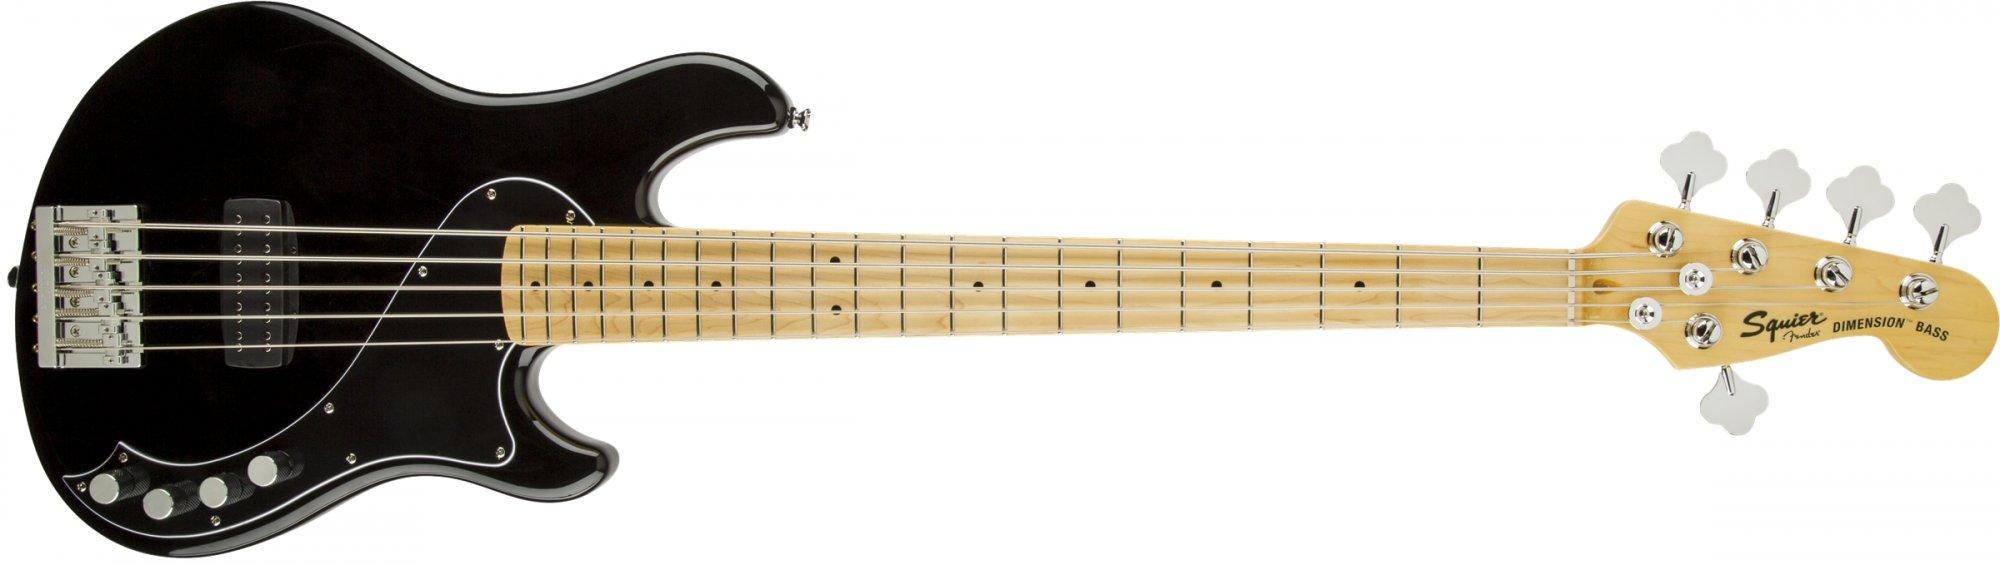 Fender Squier Deluxe Dimension Bass V MN Black